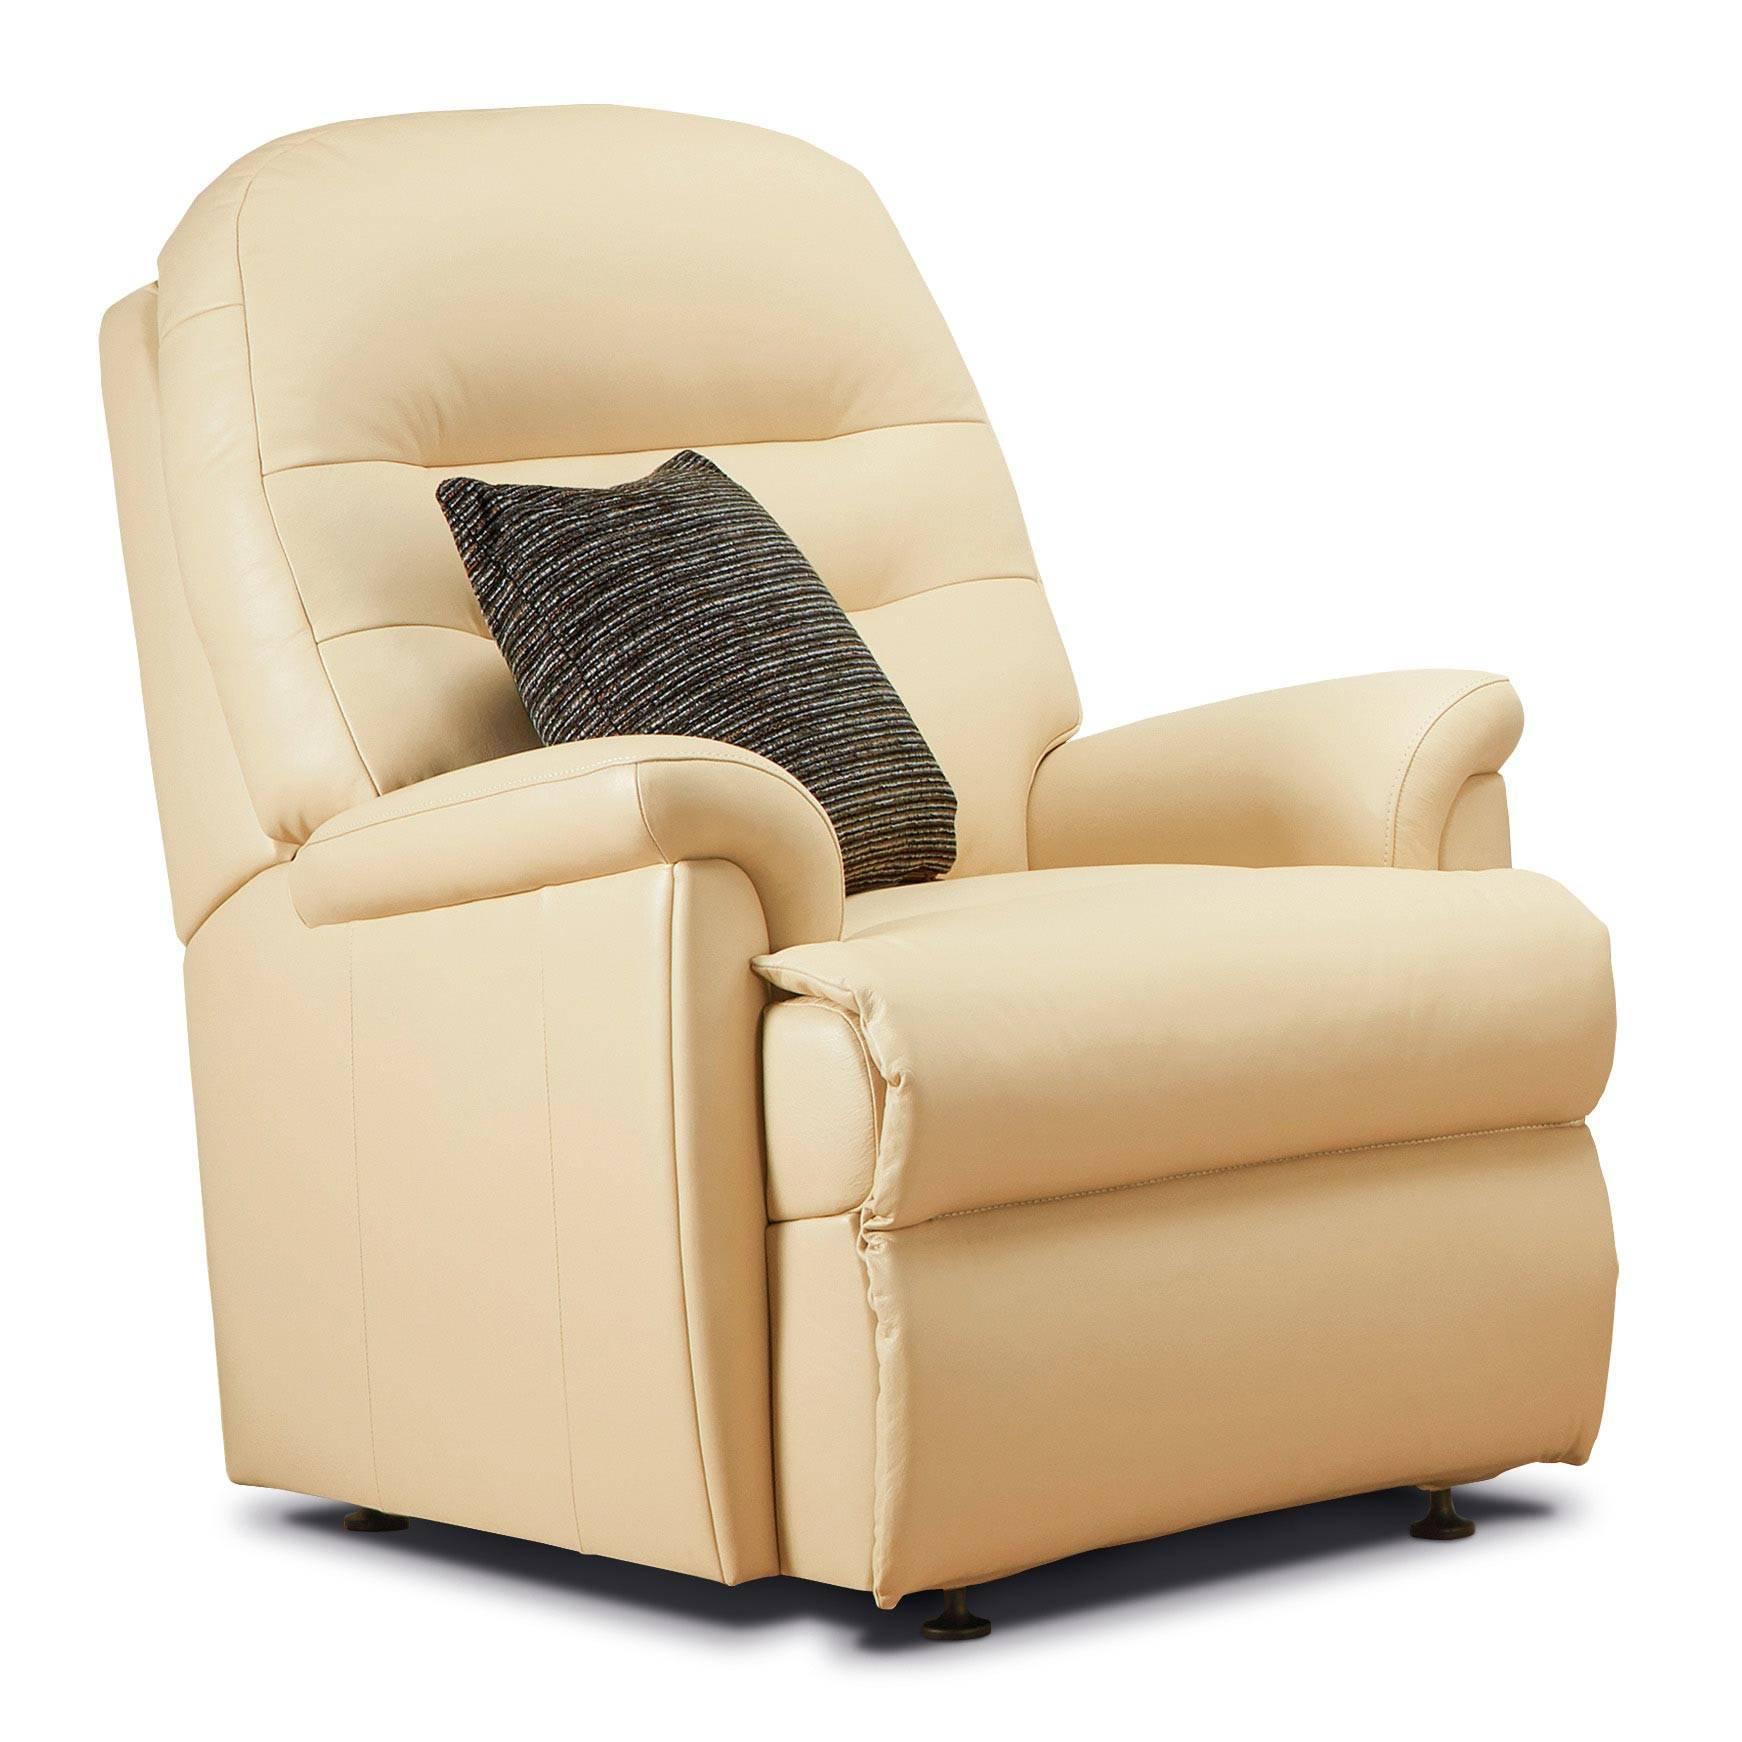 Sherborne Keswick Chair Oldrids Amp Downtown Oldrids